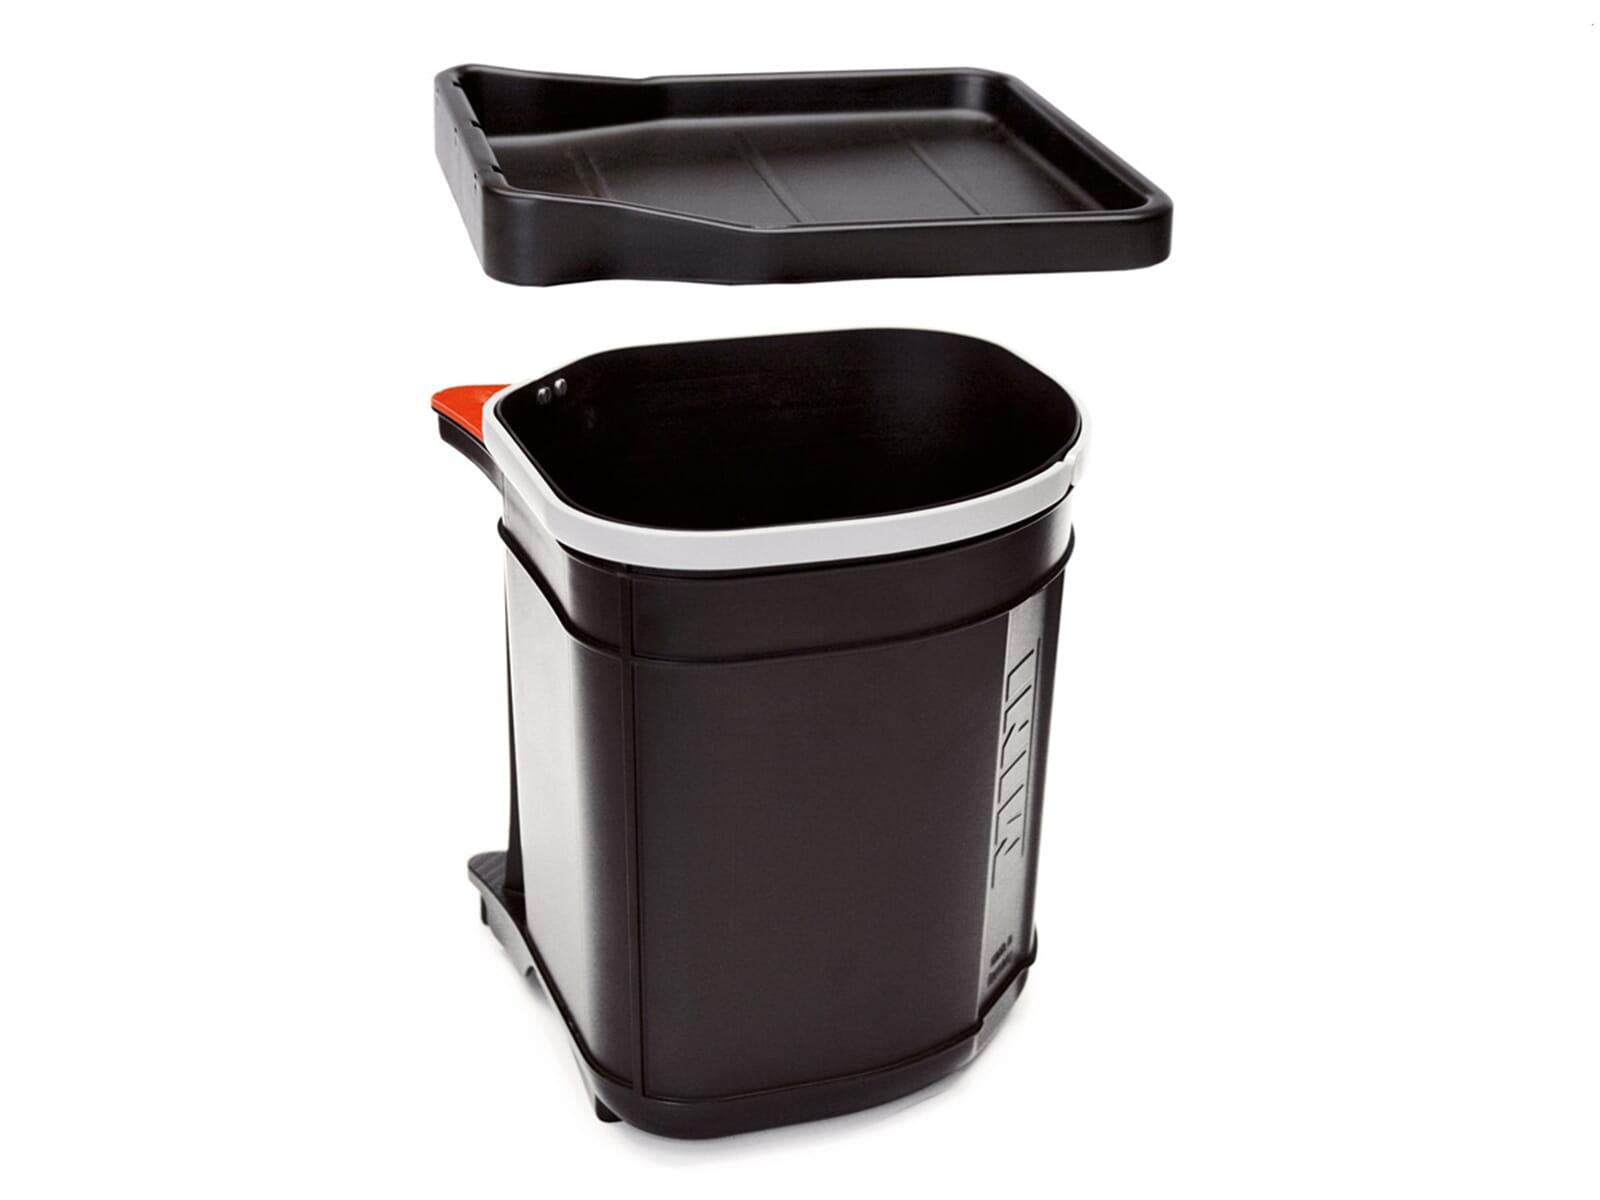 Produktabbildung Franke Sorter Mini - 121.0176.518 Einbau Abfallsammler